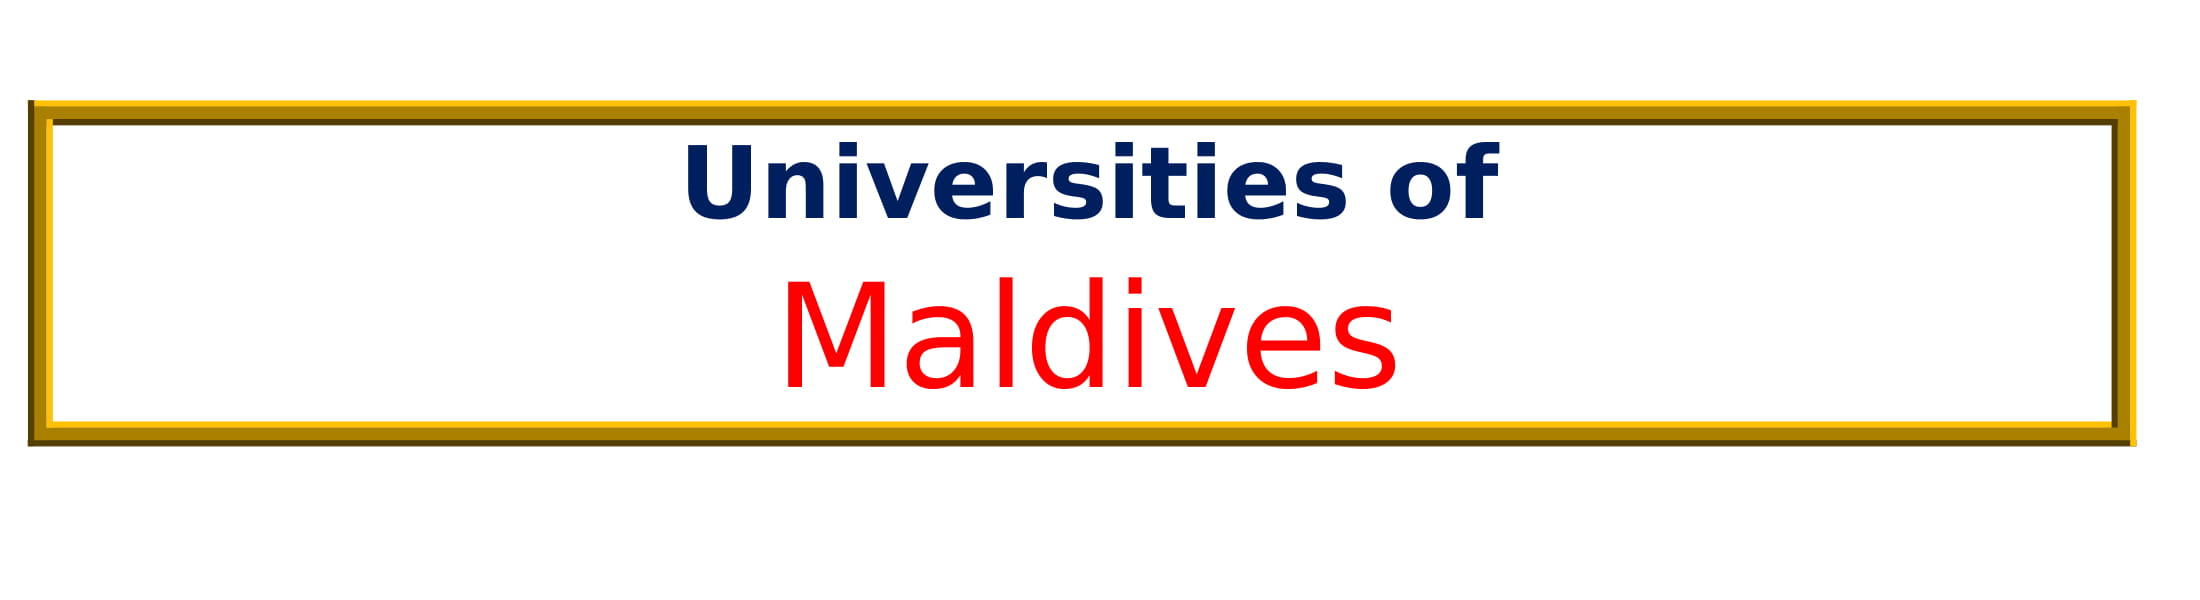 List of Universities in Maldives